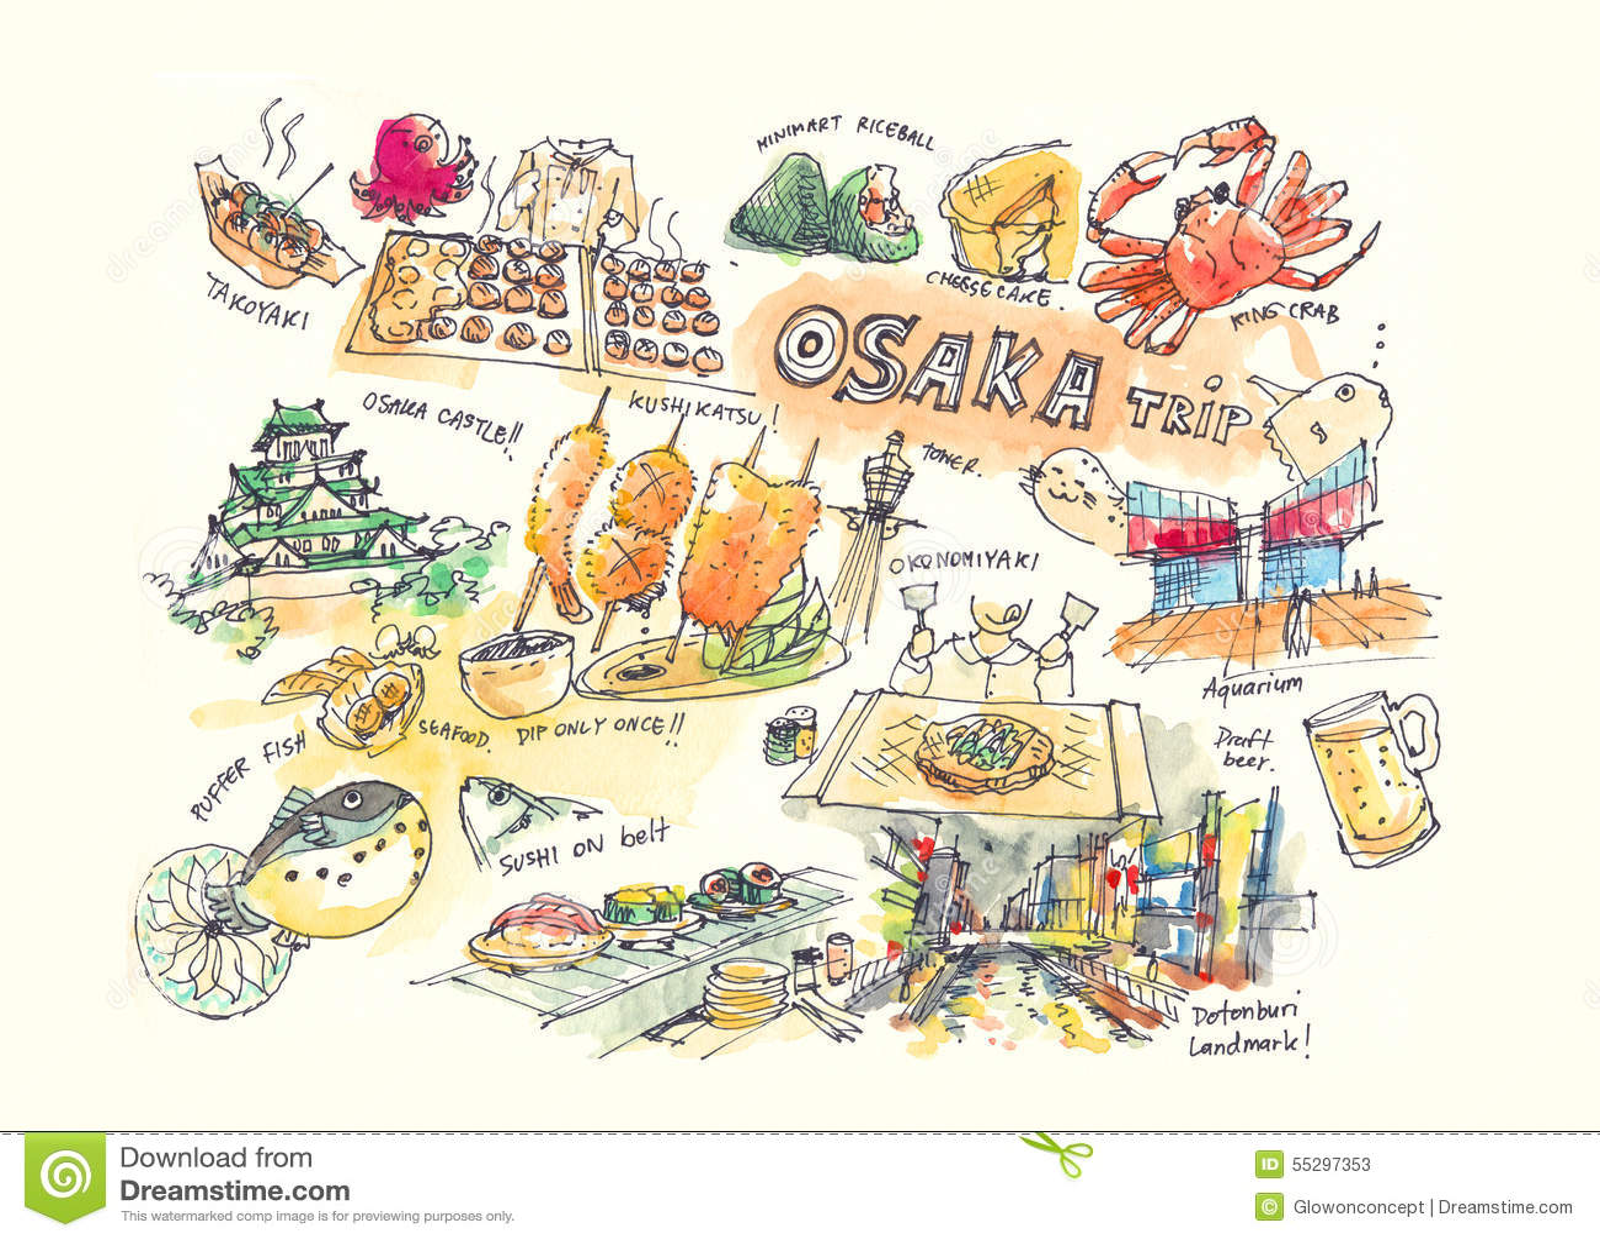 Okonomiyaki Cartoons, Illustrations & Vector Stock Images - 5 Pictures to download ...